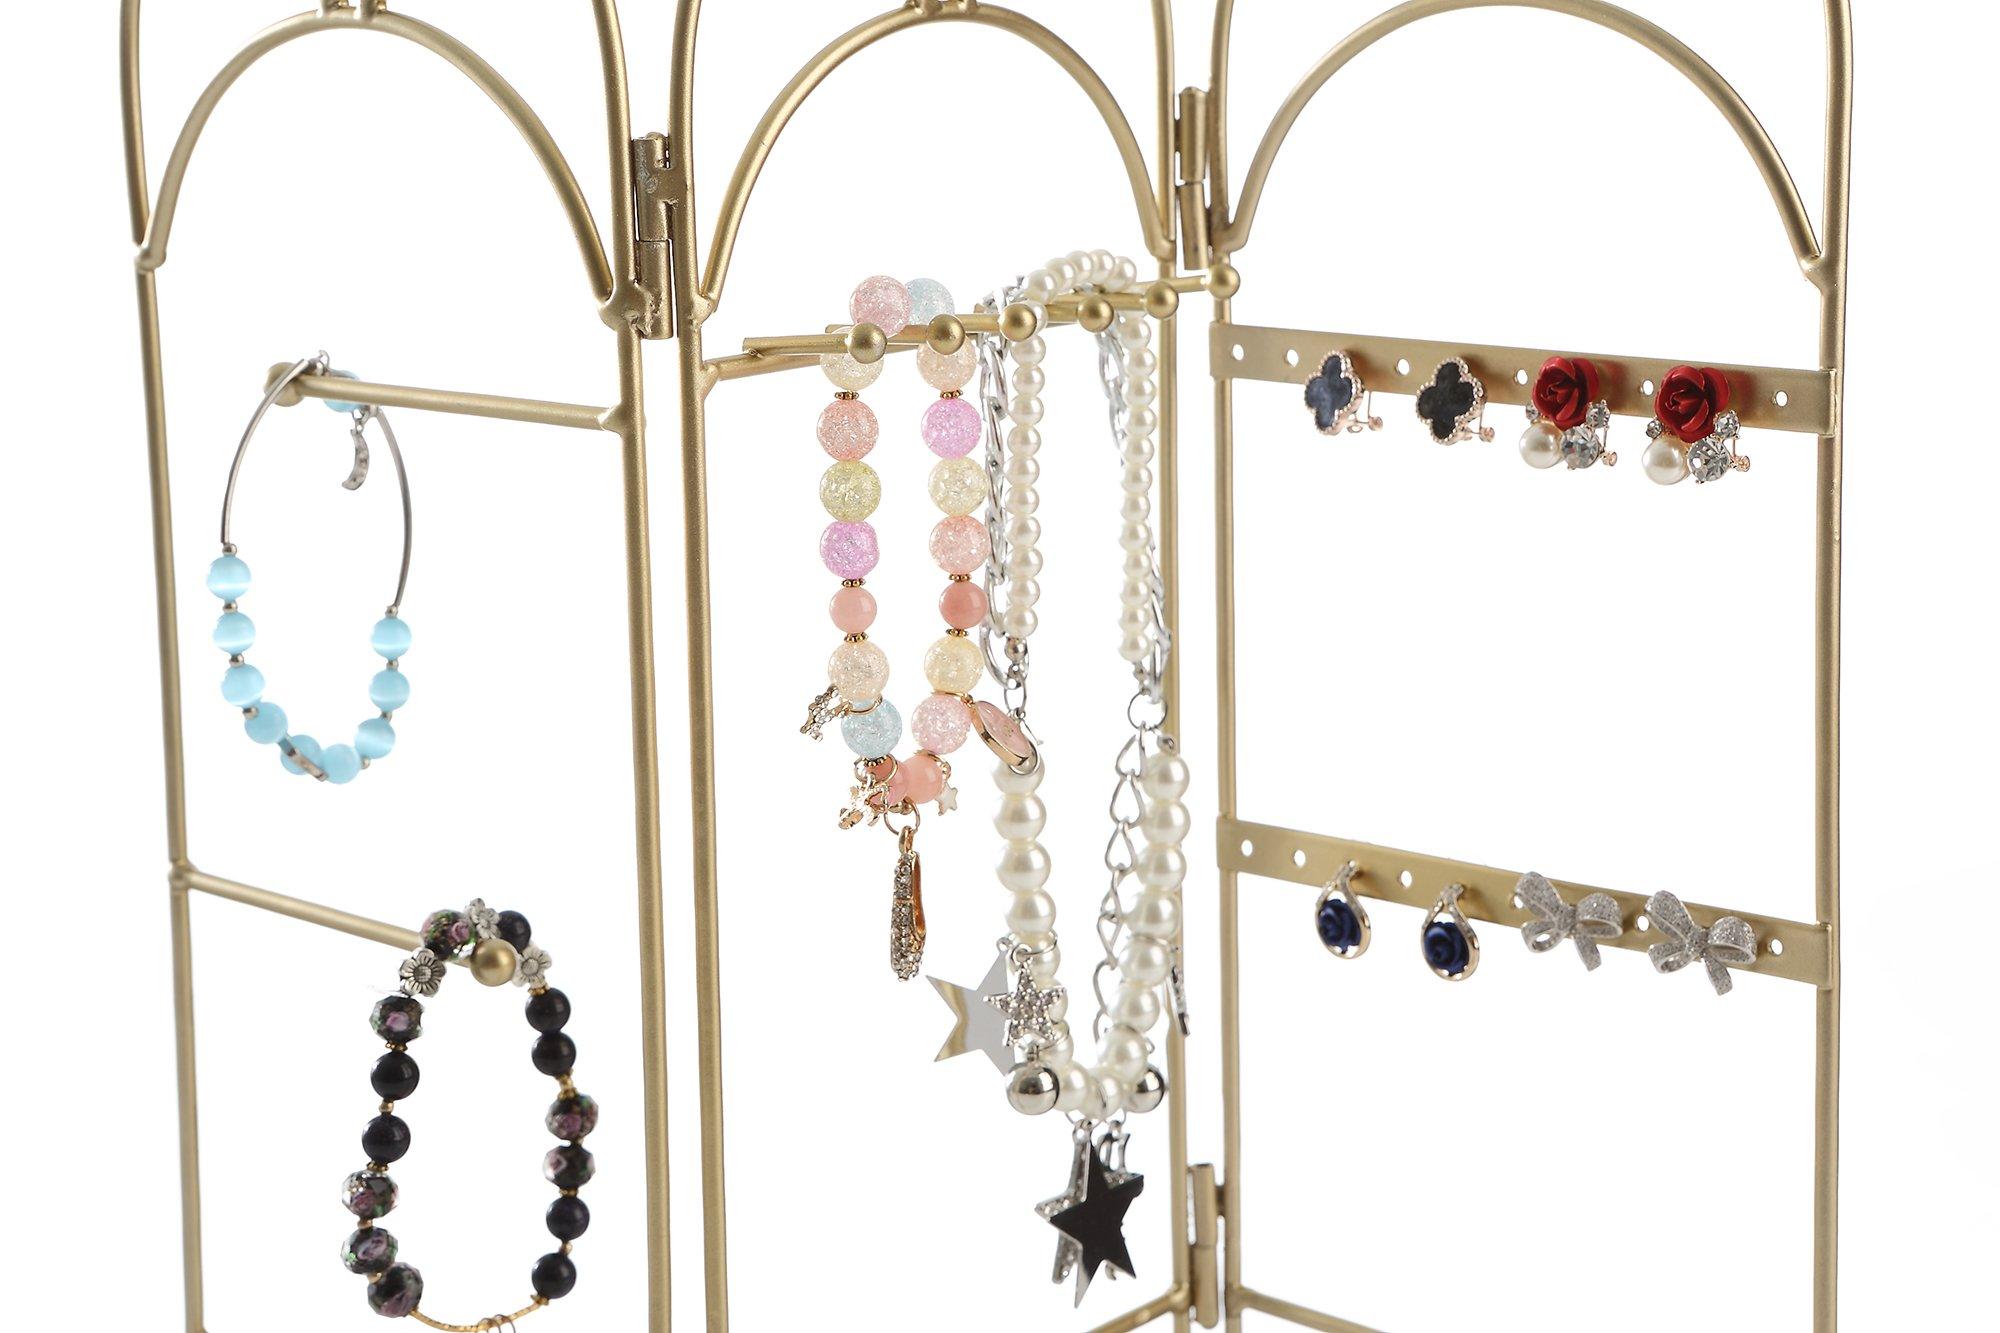 Modern Gold Metal 3 Panel Trellis Folding Jewelry Hanger Organizer for Bracelet, Earrings, Necklace